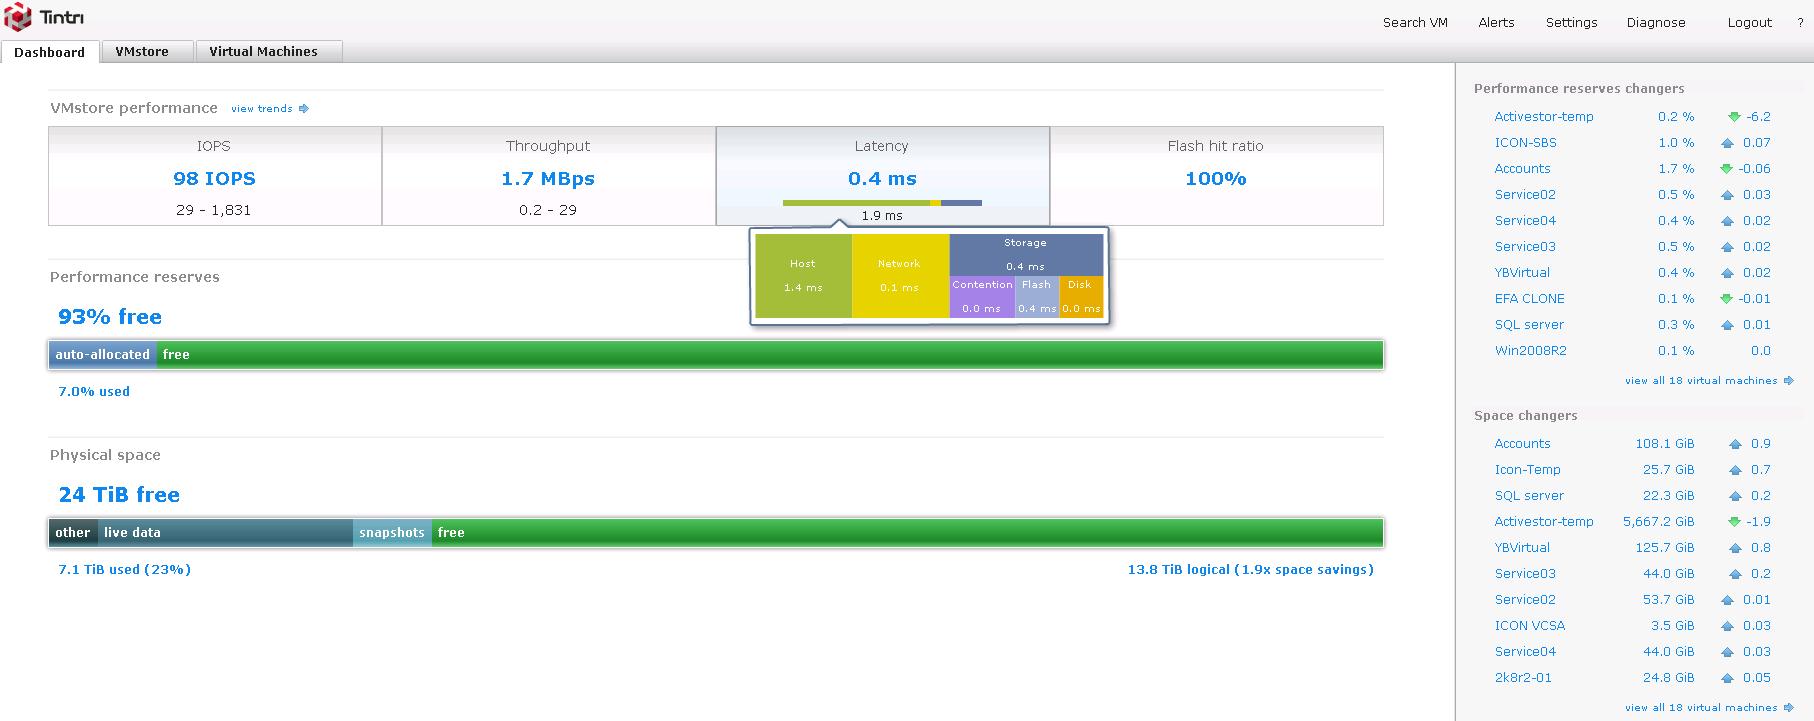 Tintri T850 UI latency explainer